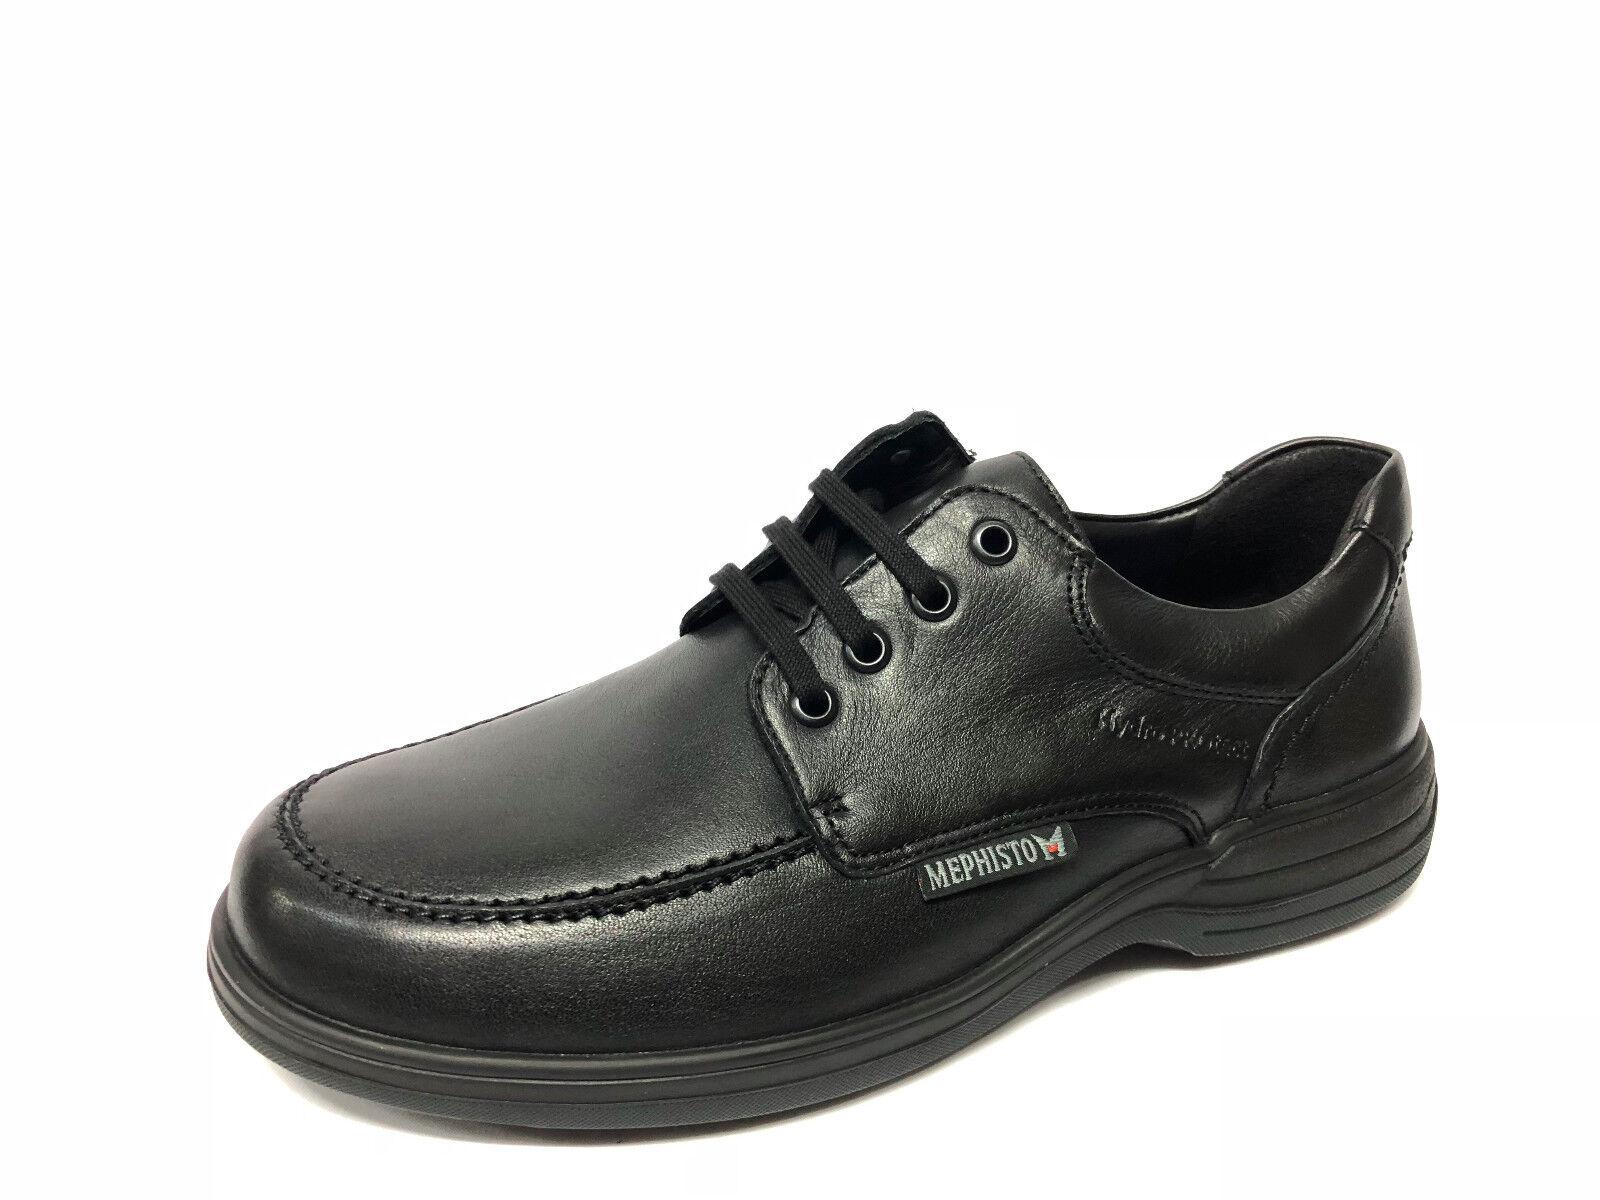 shoes Mephisto Douk pelle nera Hydropredect